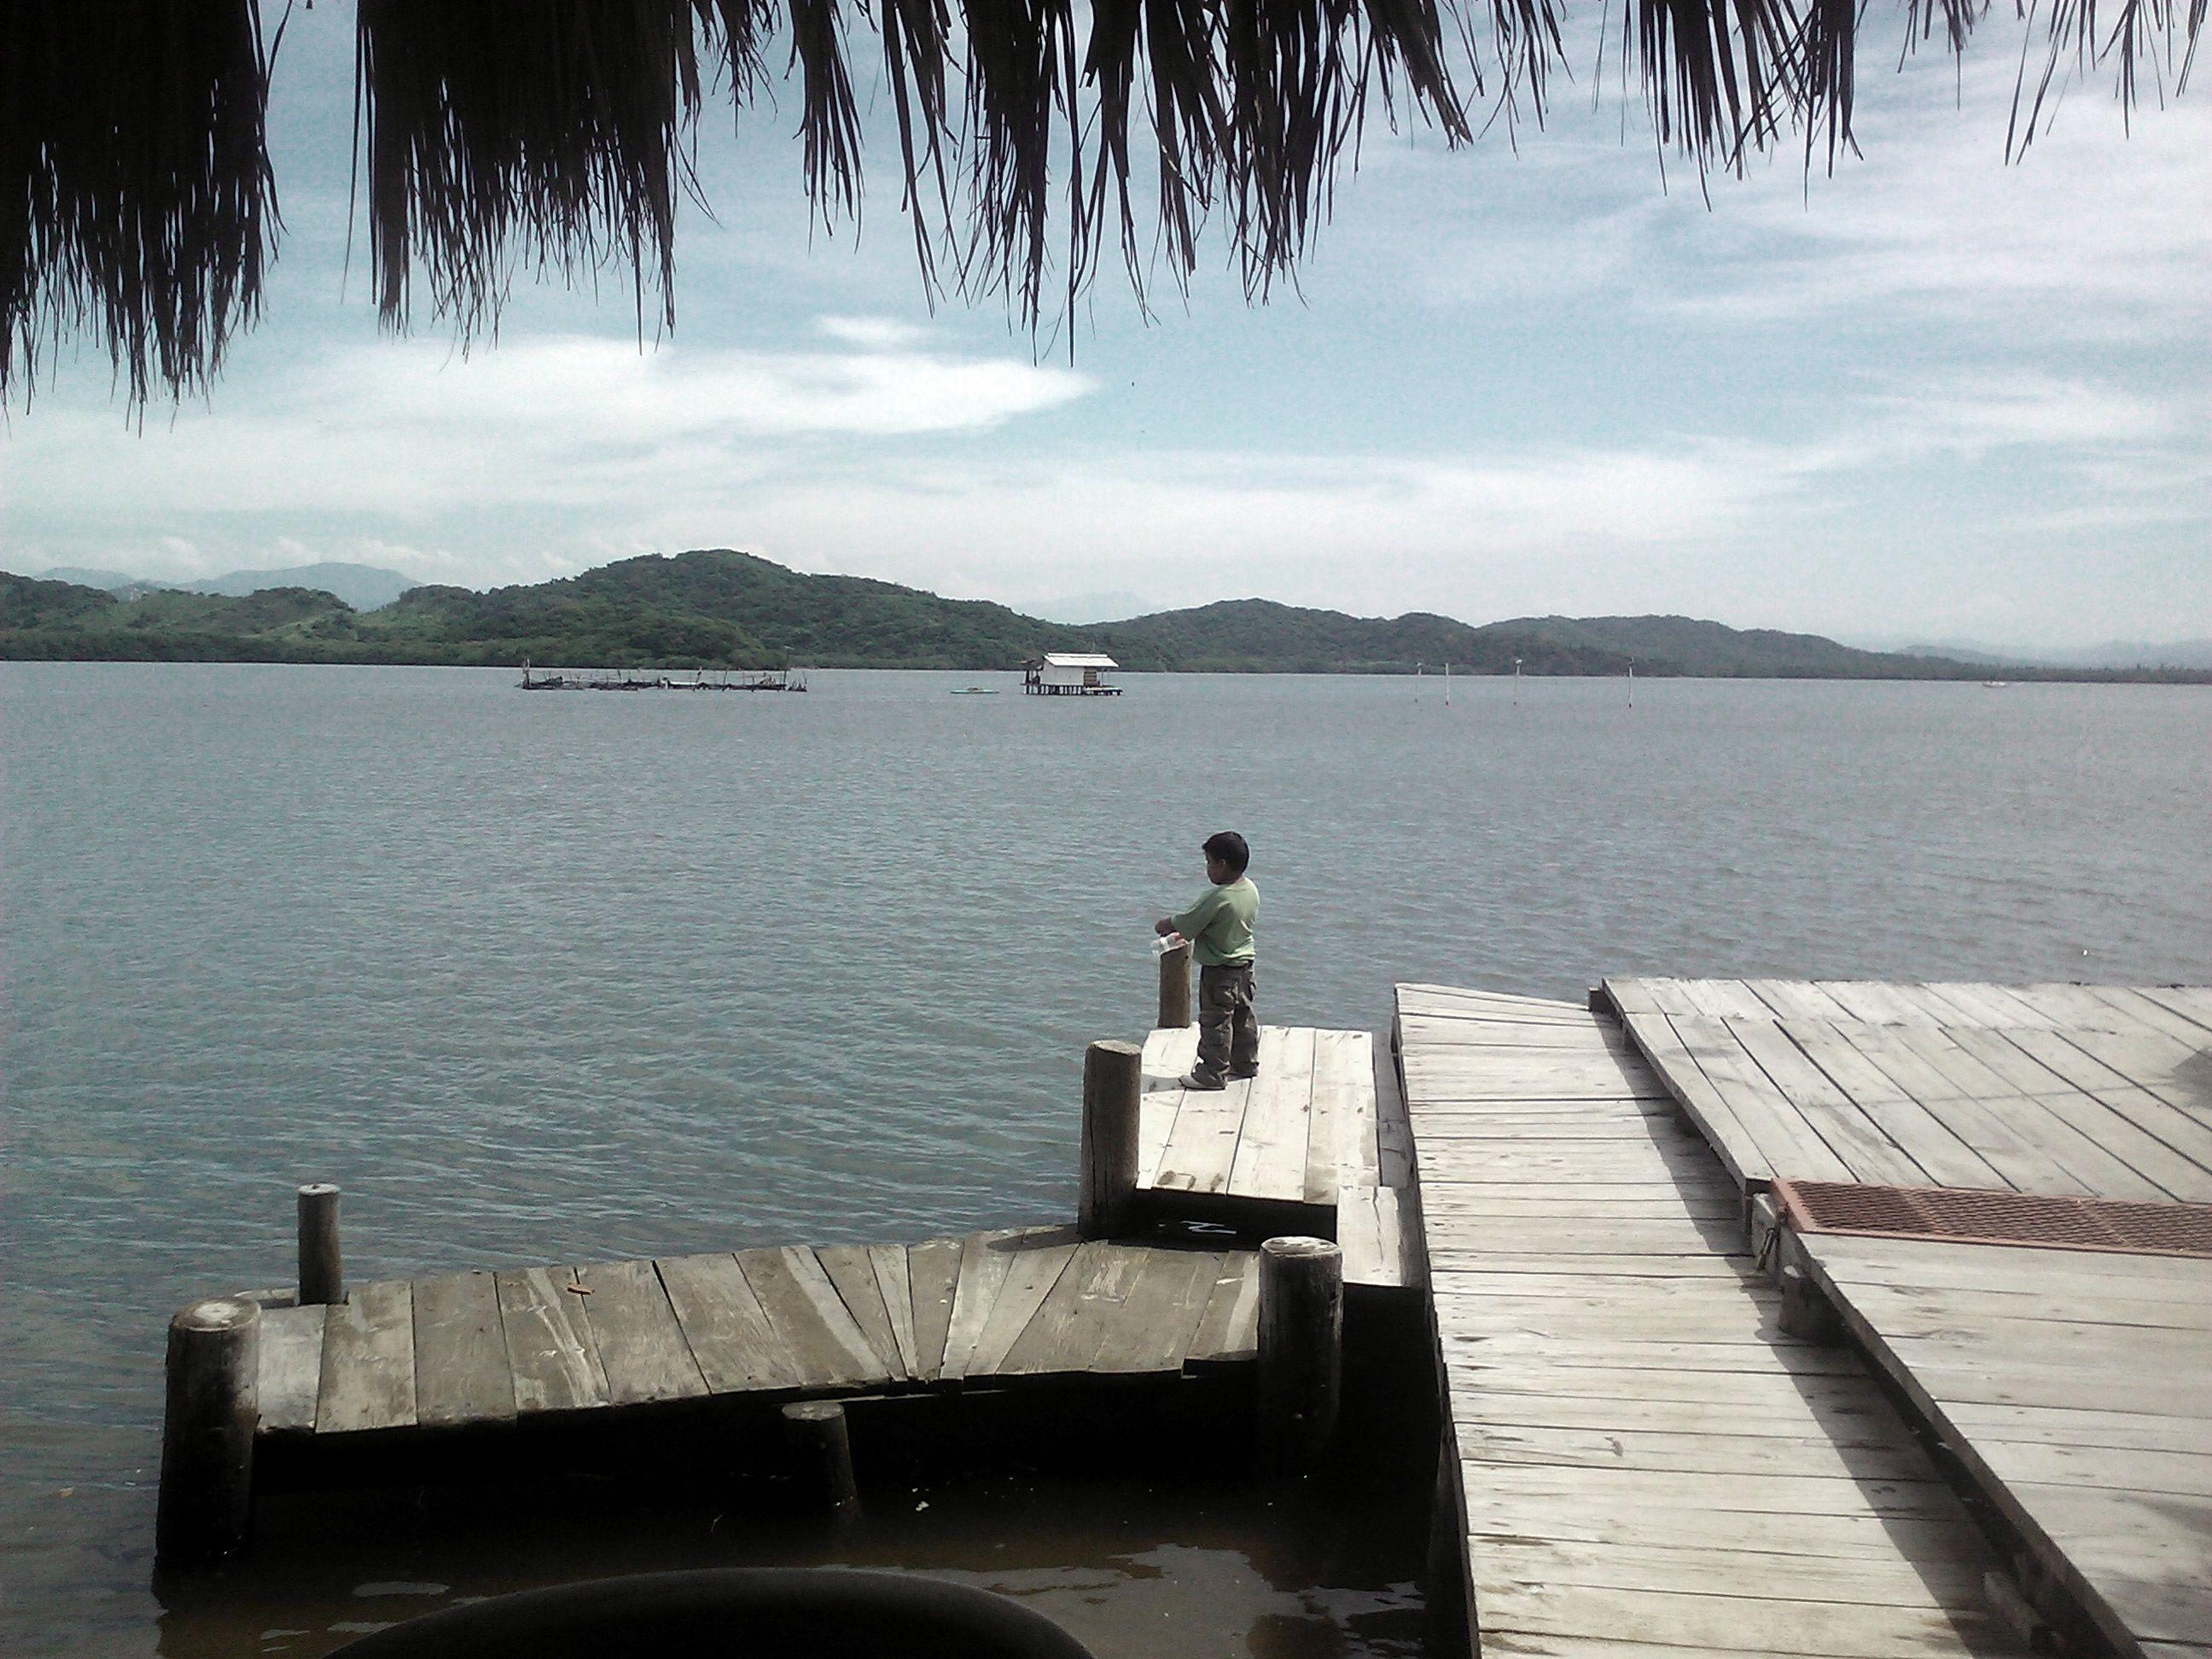 La inmensidad del lago, Colimilla, Colima